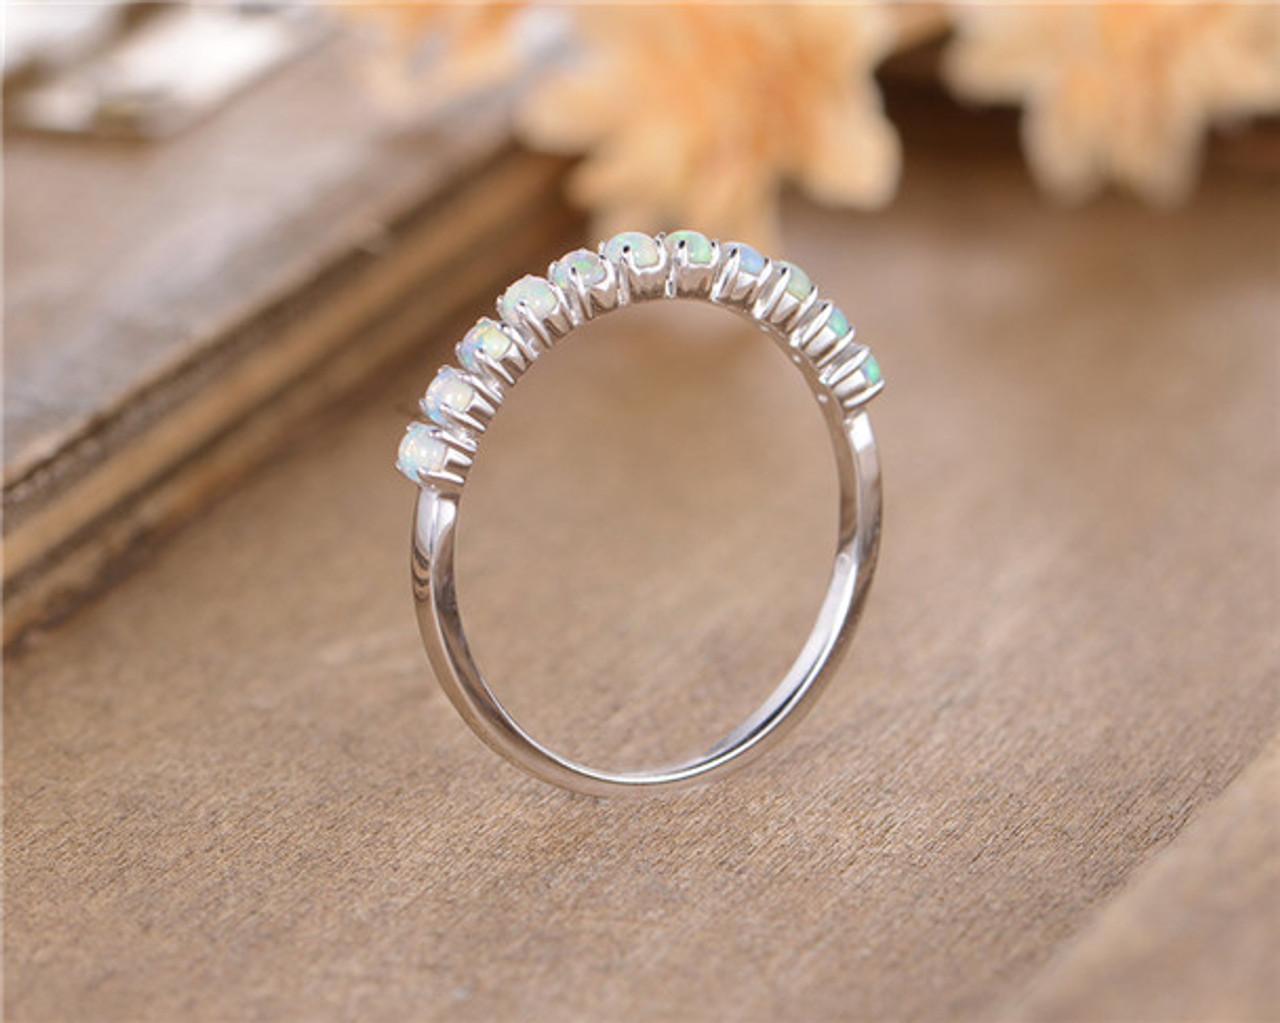 9326bbc6d024e7 Opal Wedding Band Women White Gold October Birthstone Anniversary Gift  Promise Ring